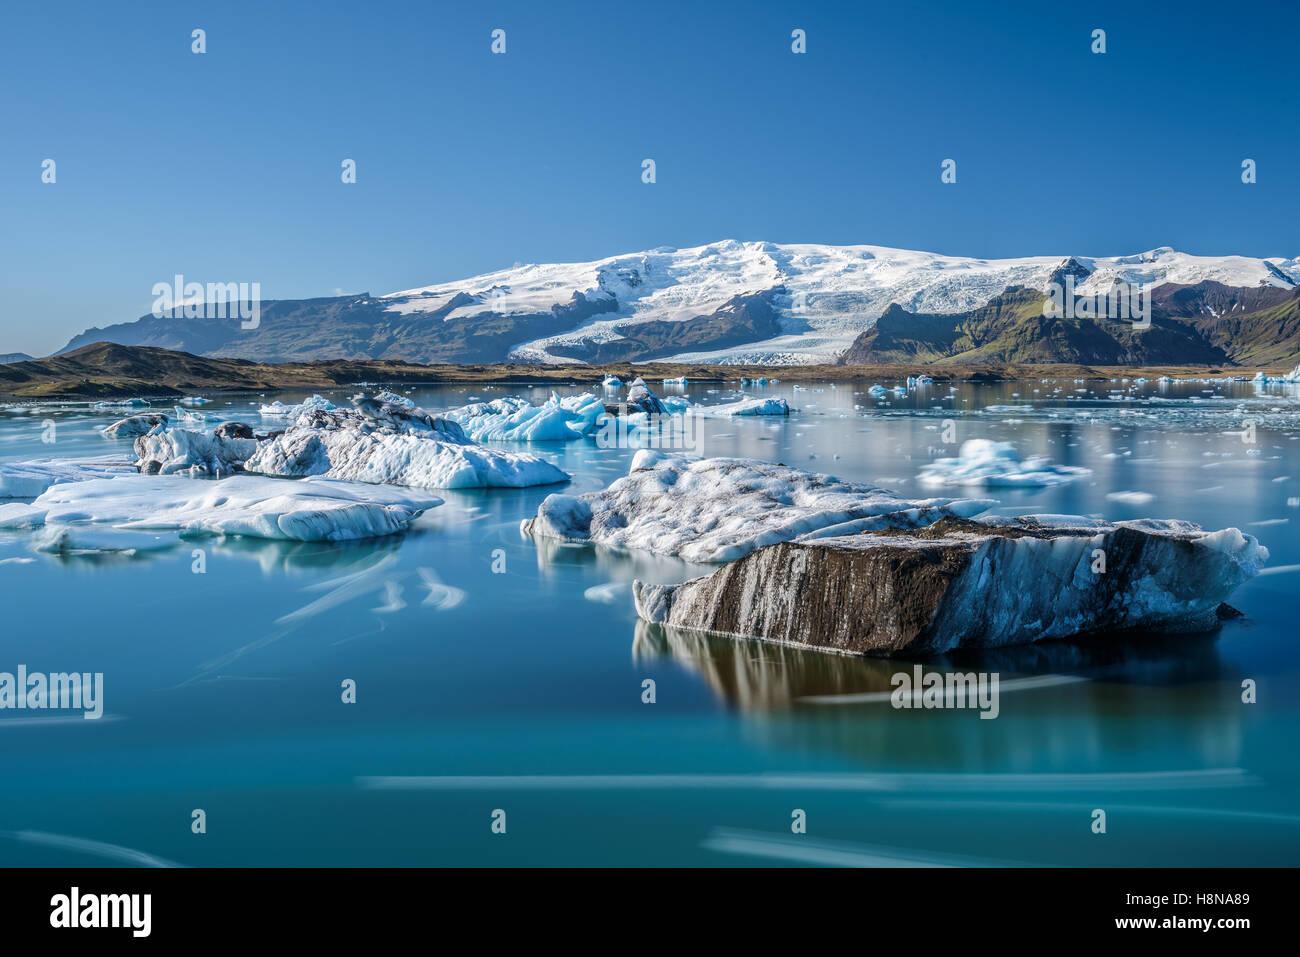 Floating icebergs in Jokulsarlon glacier lagoon, Iceland. - Stock Image